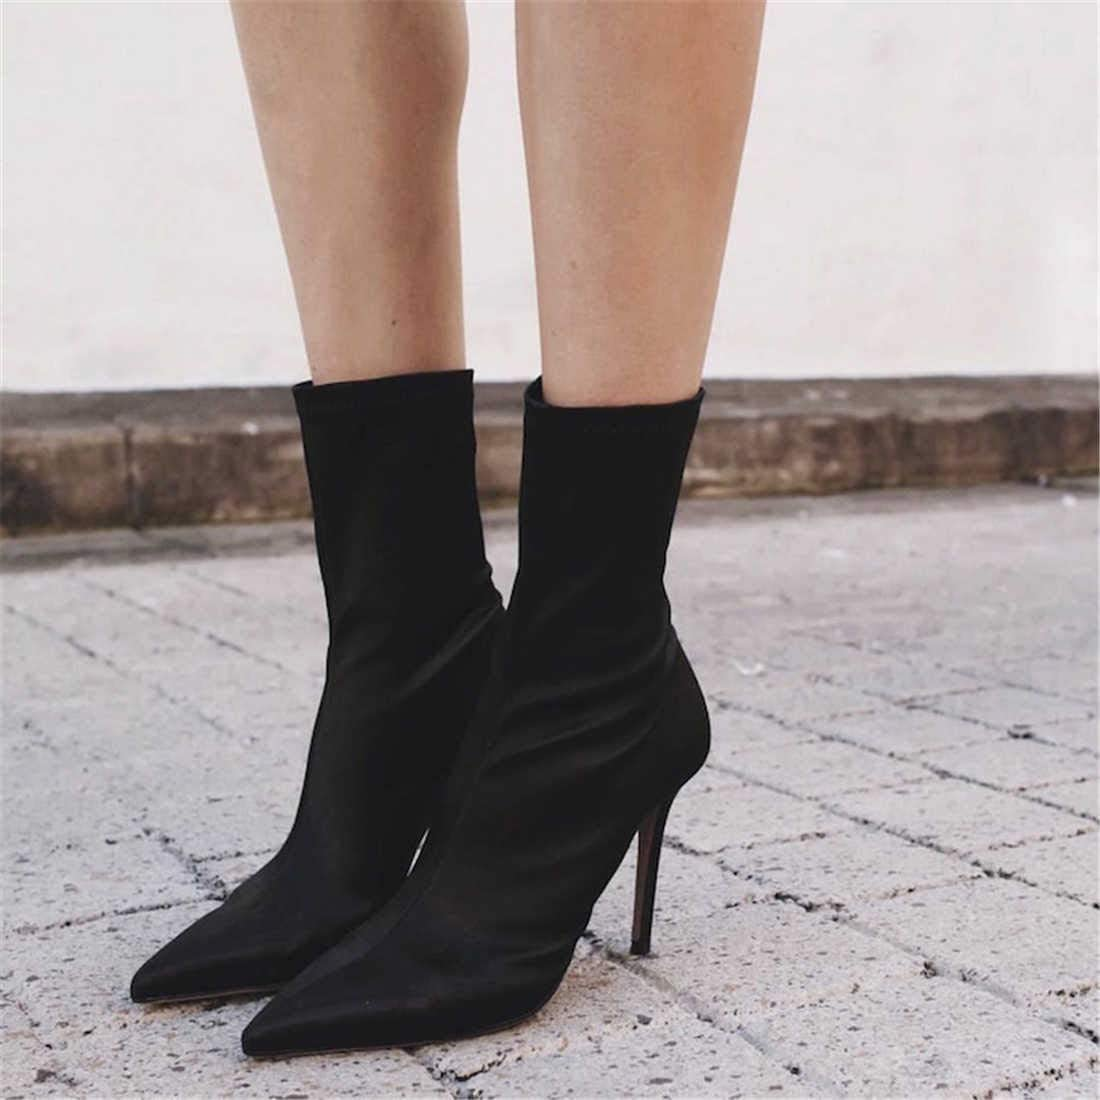 BZBZBZ 11Cm Stiletto Pointed Toe Ankle Boot Women Stretch Socks Boots Party Dress Shoes Eu Size 35-40 Black